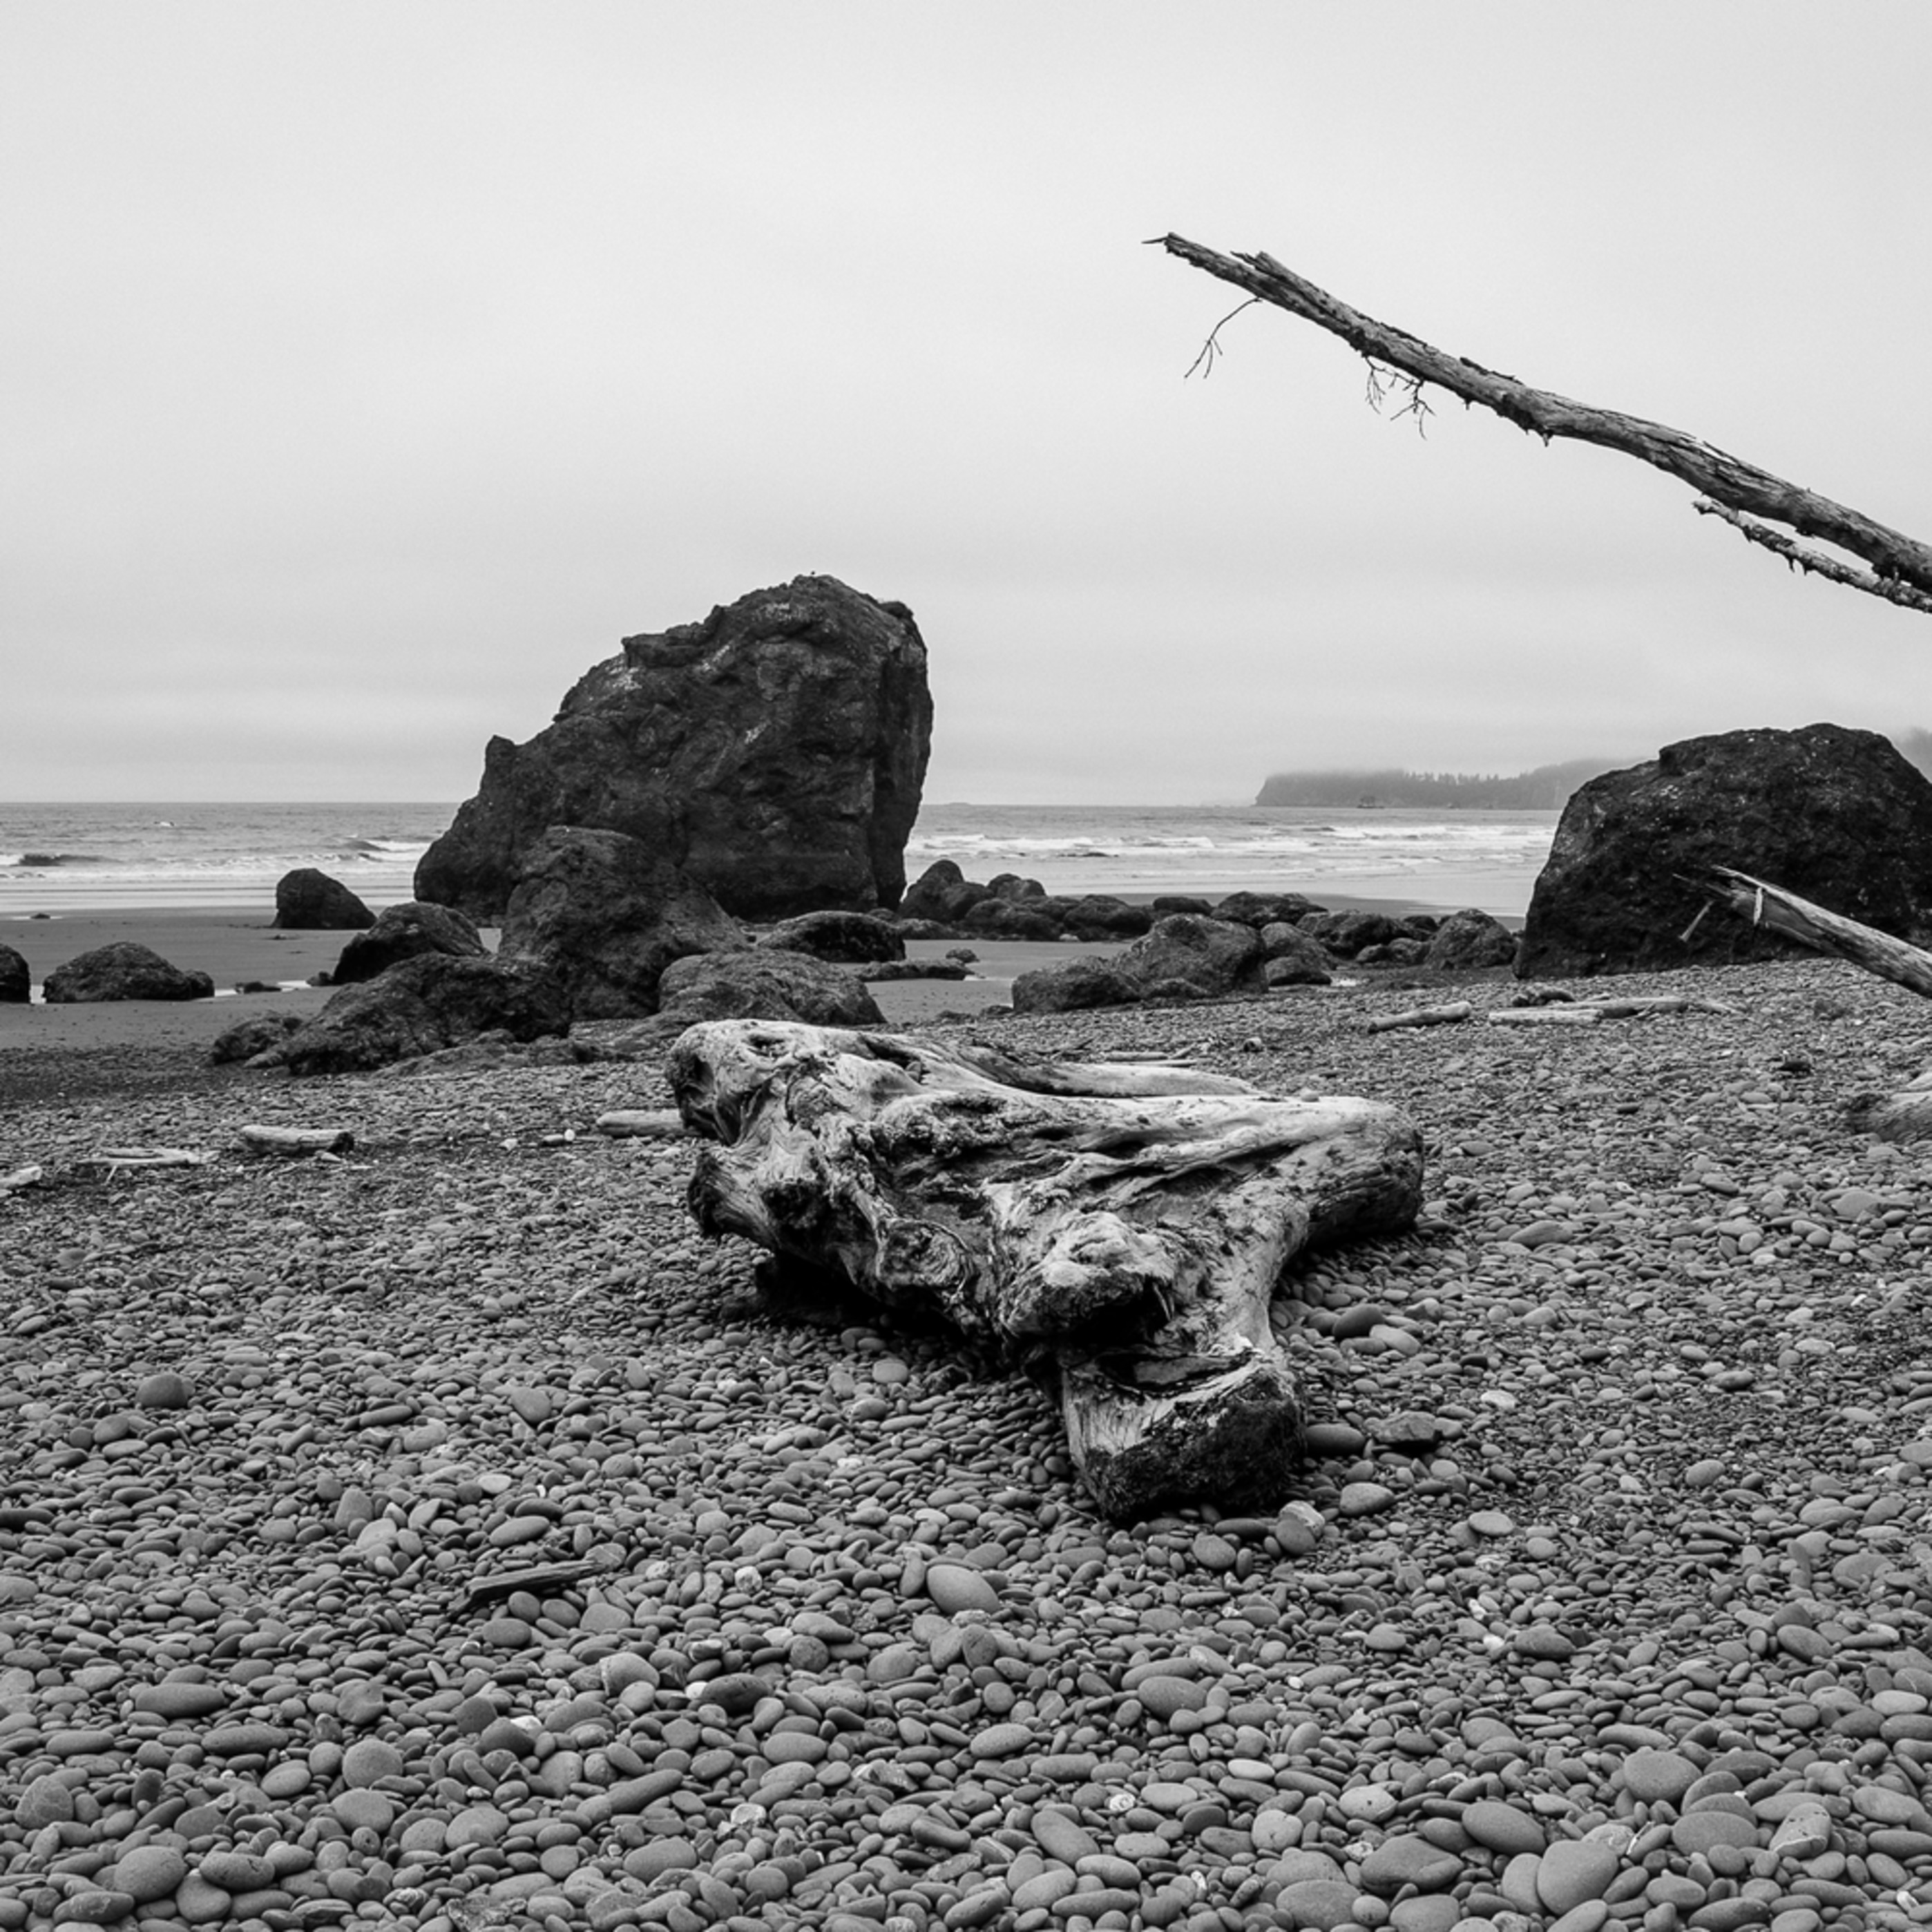 Rocky shoreline ruby beach olympic national park washington 2013 gopht8